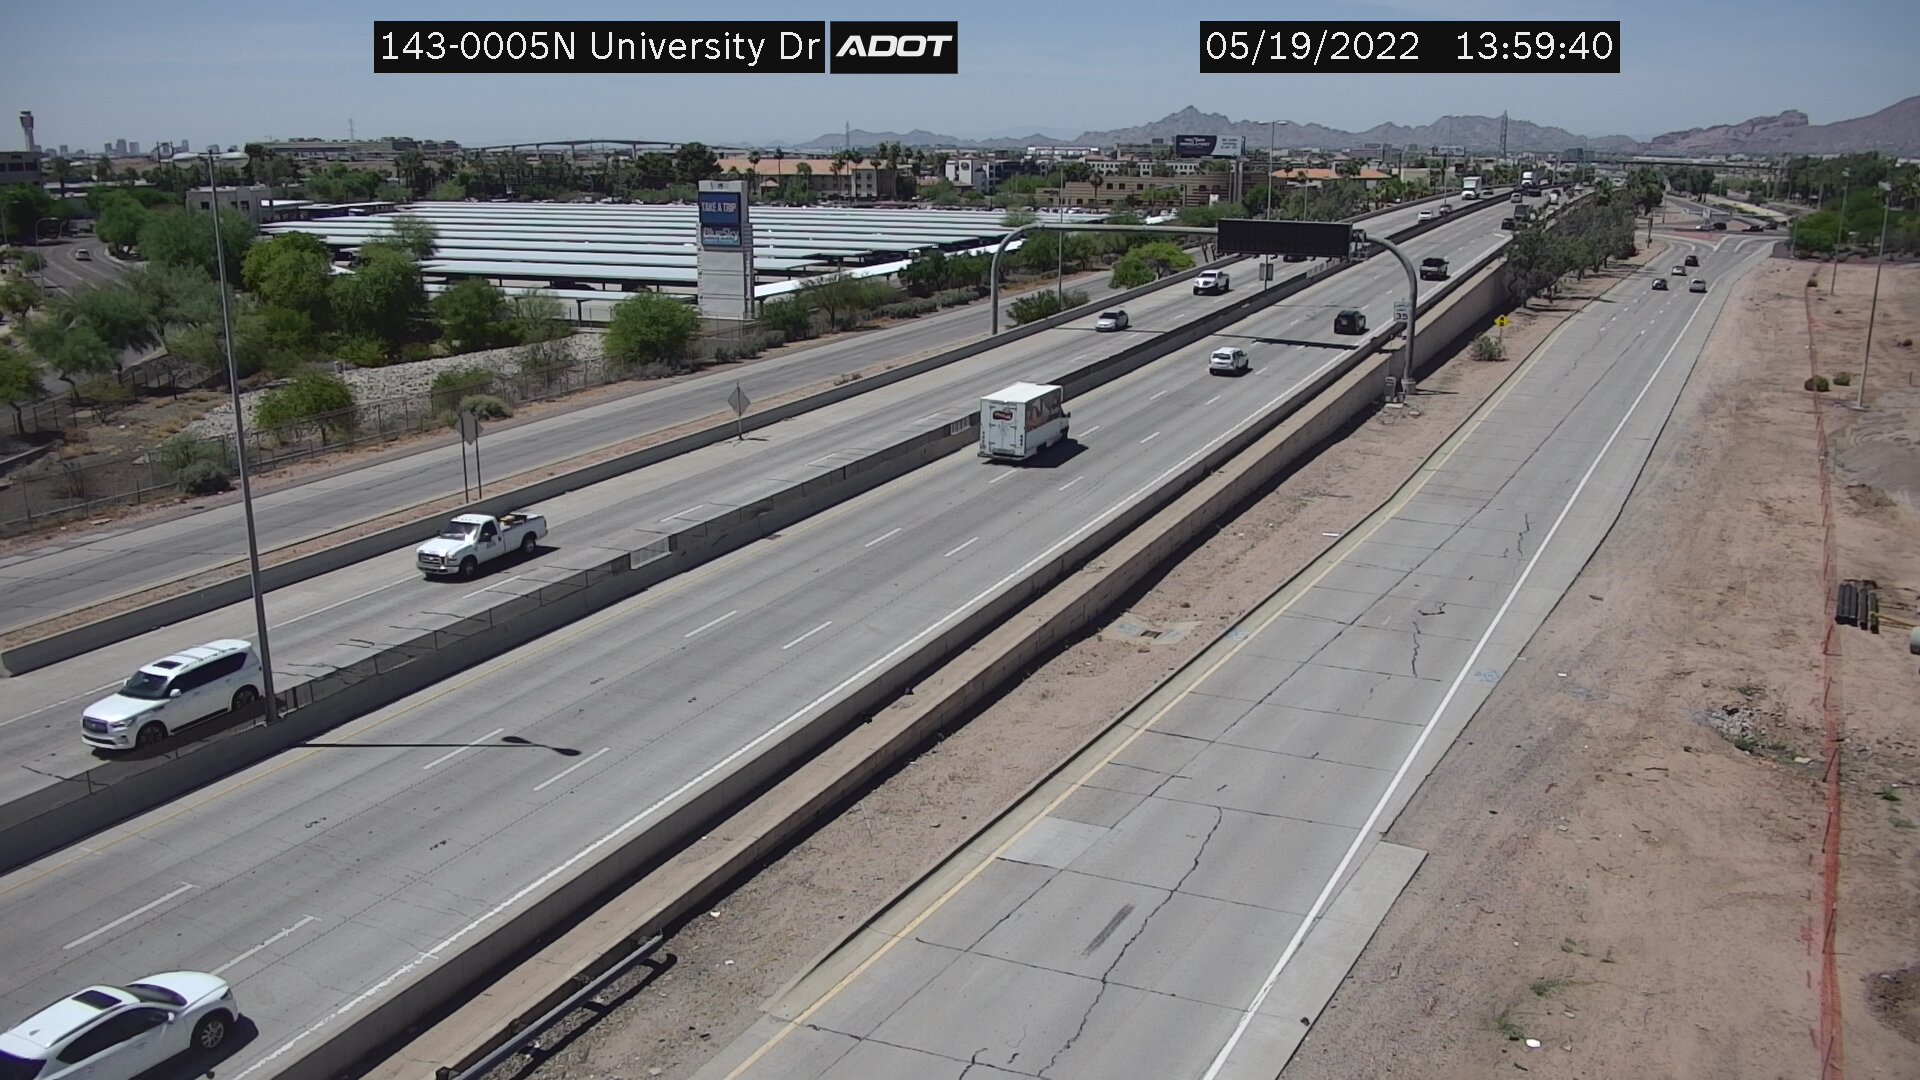 University NB (SR143) (097) - Phoenix and Arizona